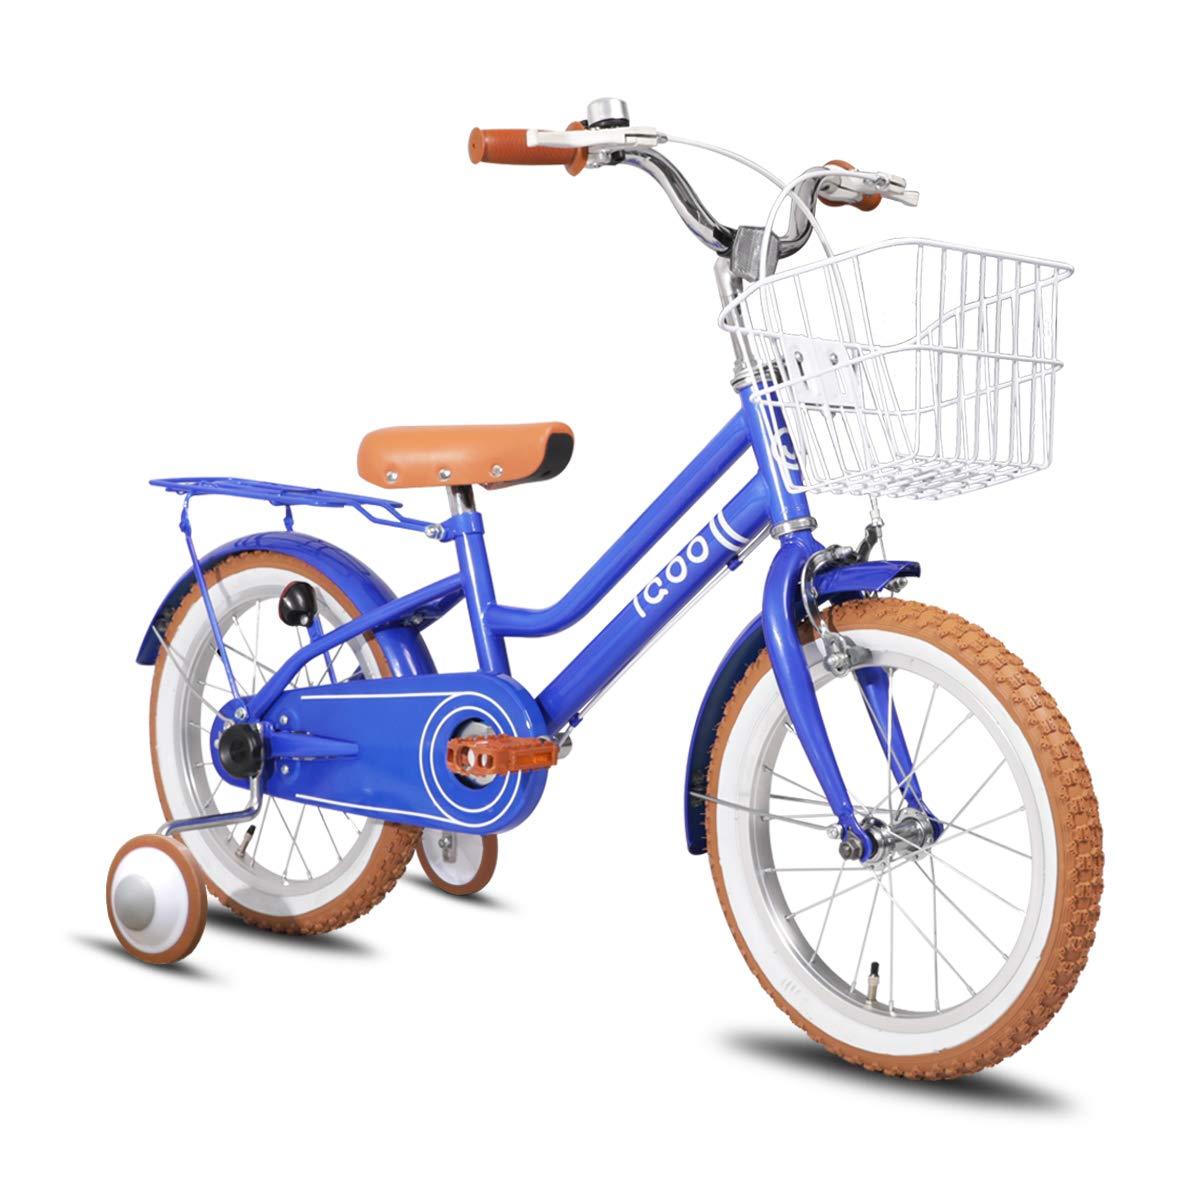 IQOO 子供自転車 3、4、5、6歳 男の子 女の子 14インチ 16インチ 幼児用自転車 レトロ可愛い お誕生日プレゼント プリン 可愛い カゴ ベル 補助輪付き おしゃれ ガール ボーイズ ユニセックス ピンク ブルー グリーン ブルー 16インチ